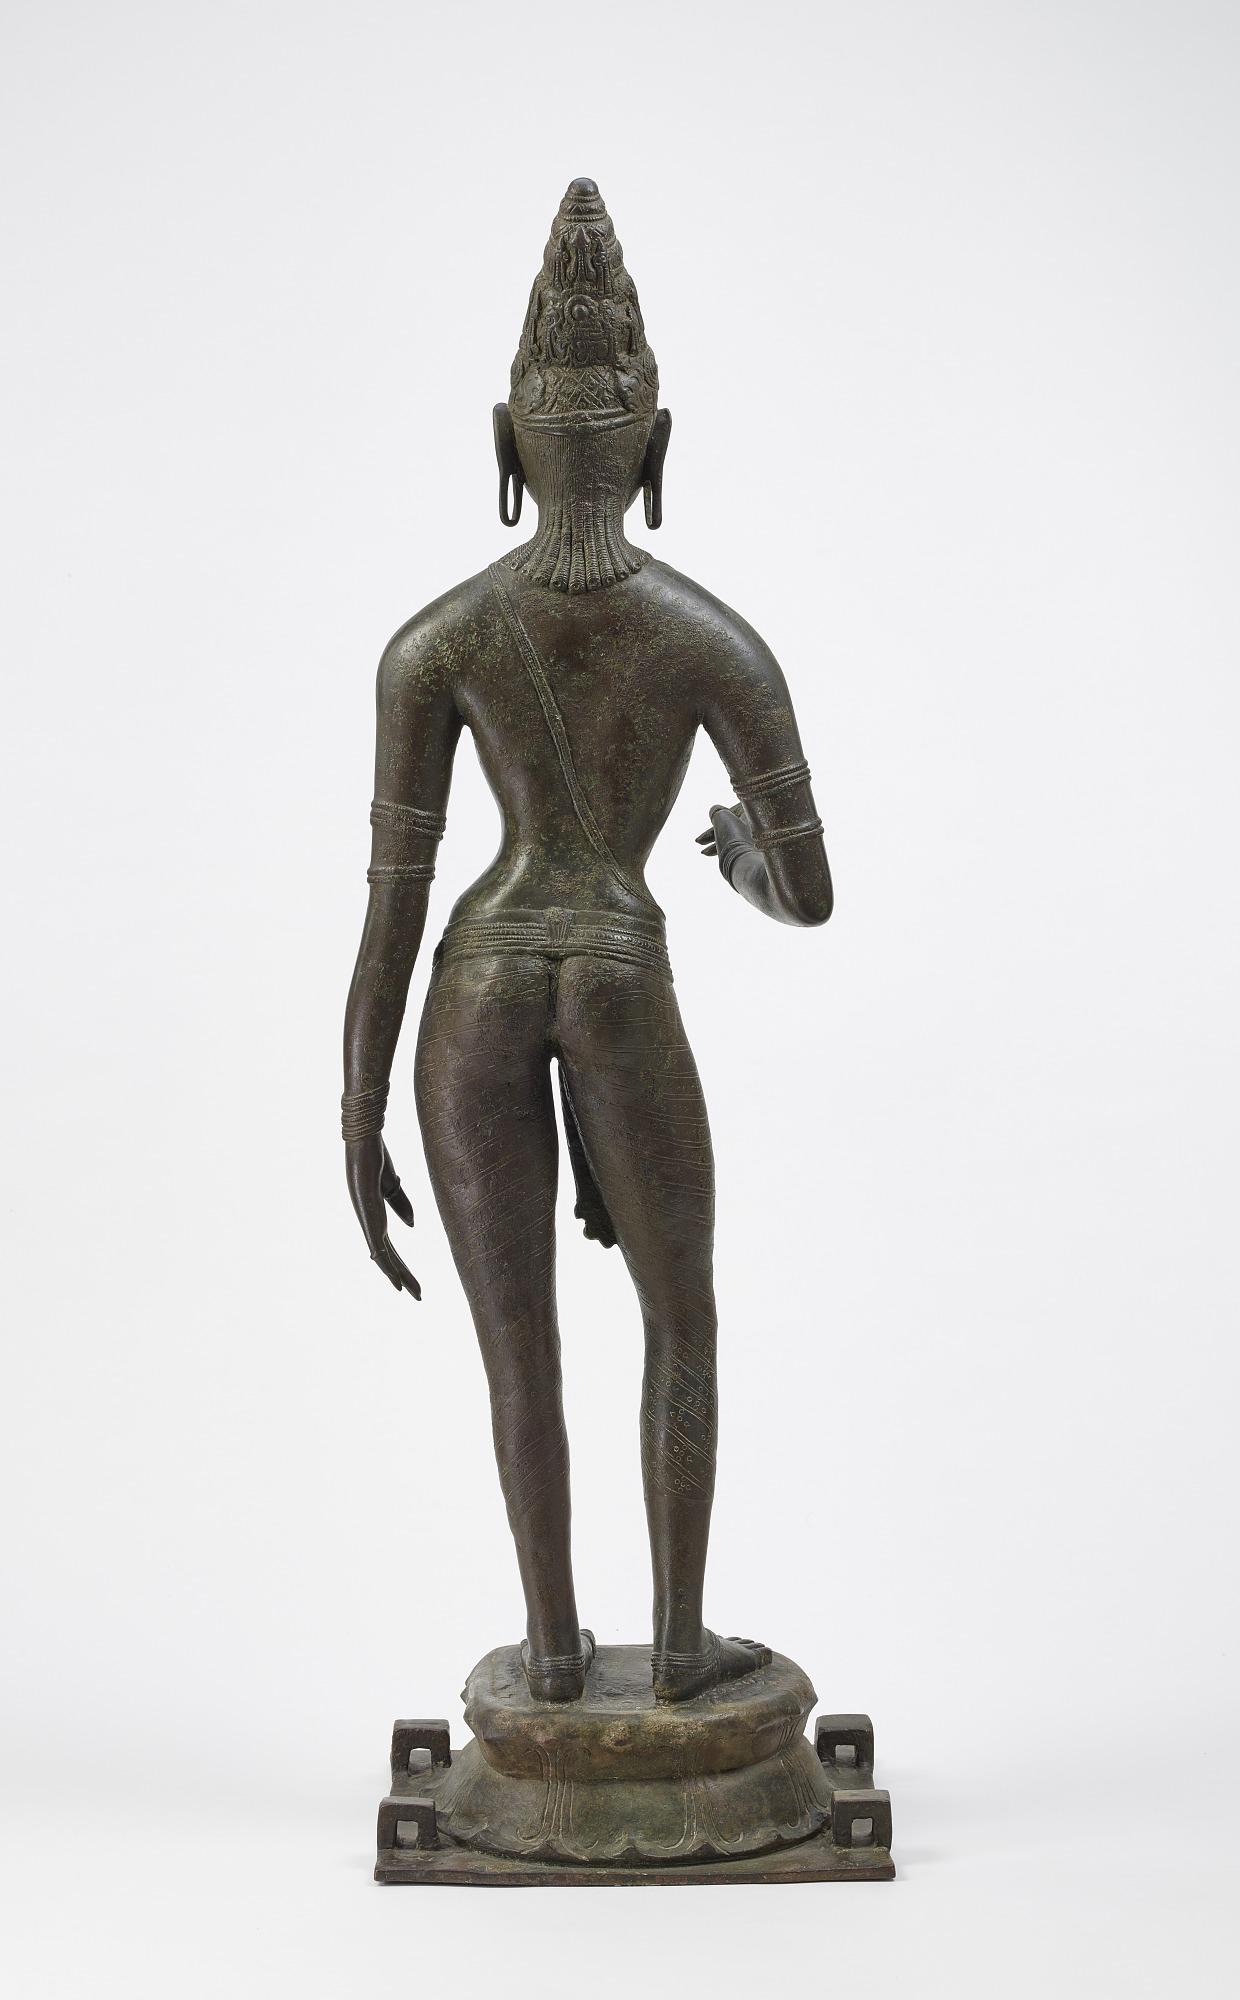 Queen Sembiyan Mahadevi as the Goddess Parvati